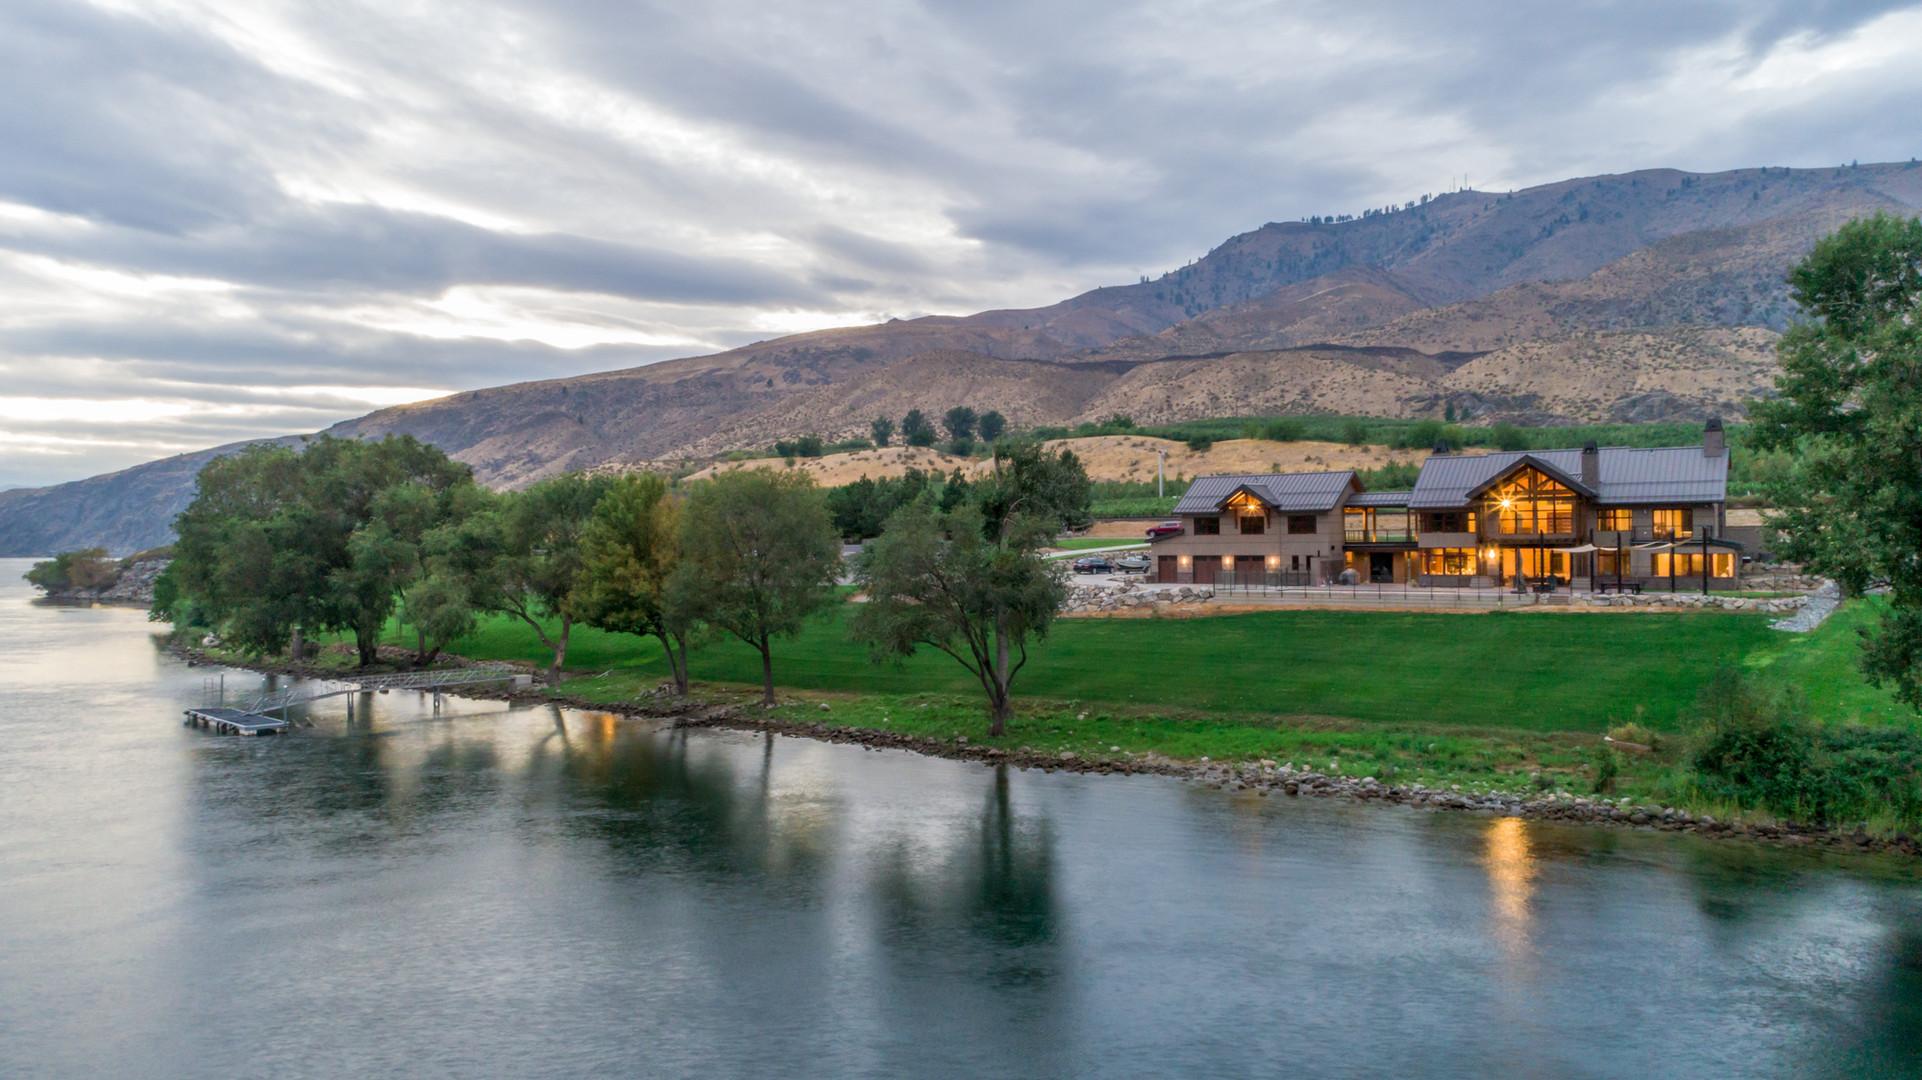 River House - Chelan, Washington - Columbia River